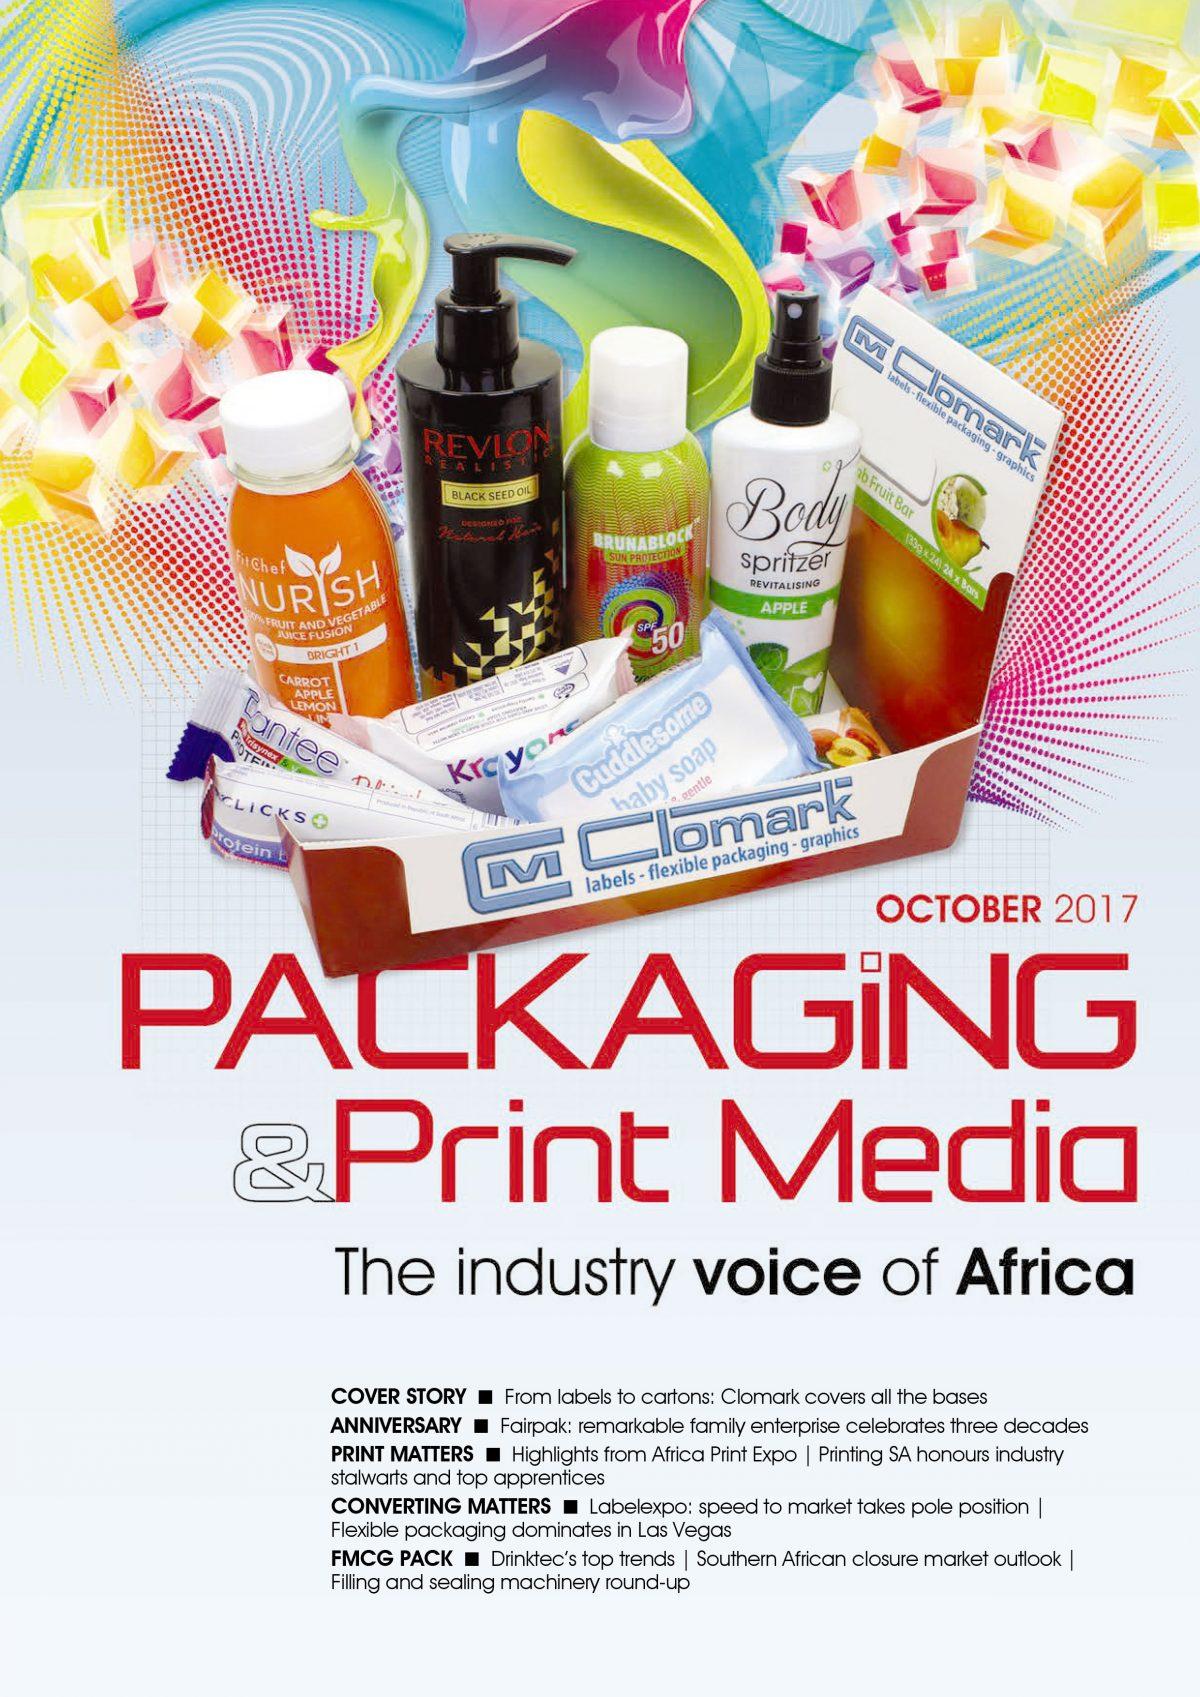 Packaging Print Media Flexo Bellissima Ultra HD Screening Labelexpo